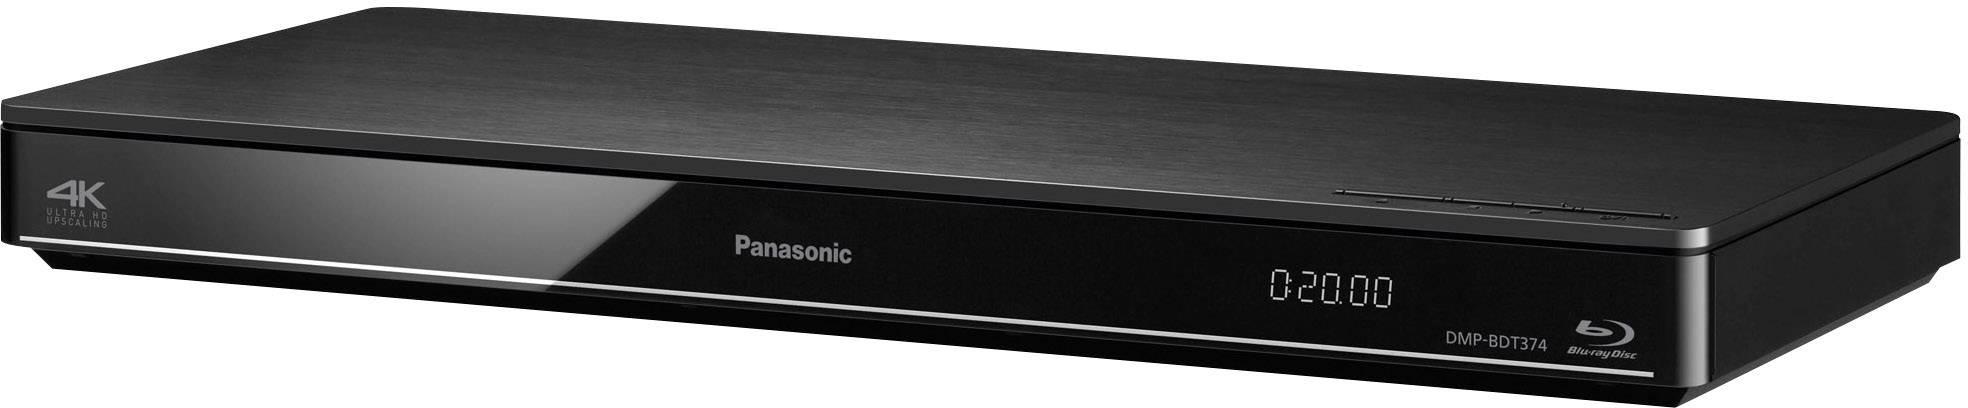 Drivers Update: Panasonic DMP-BDT374 Blu-ray Player